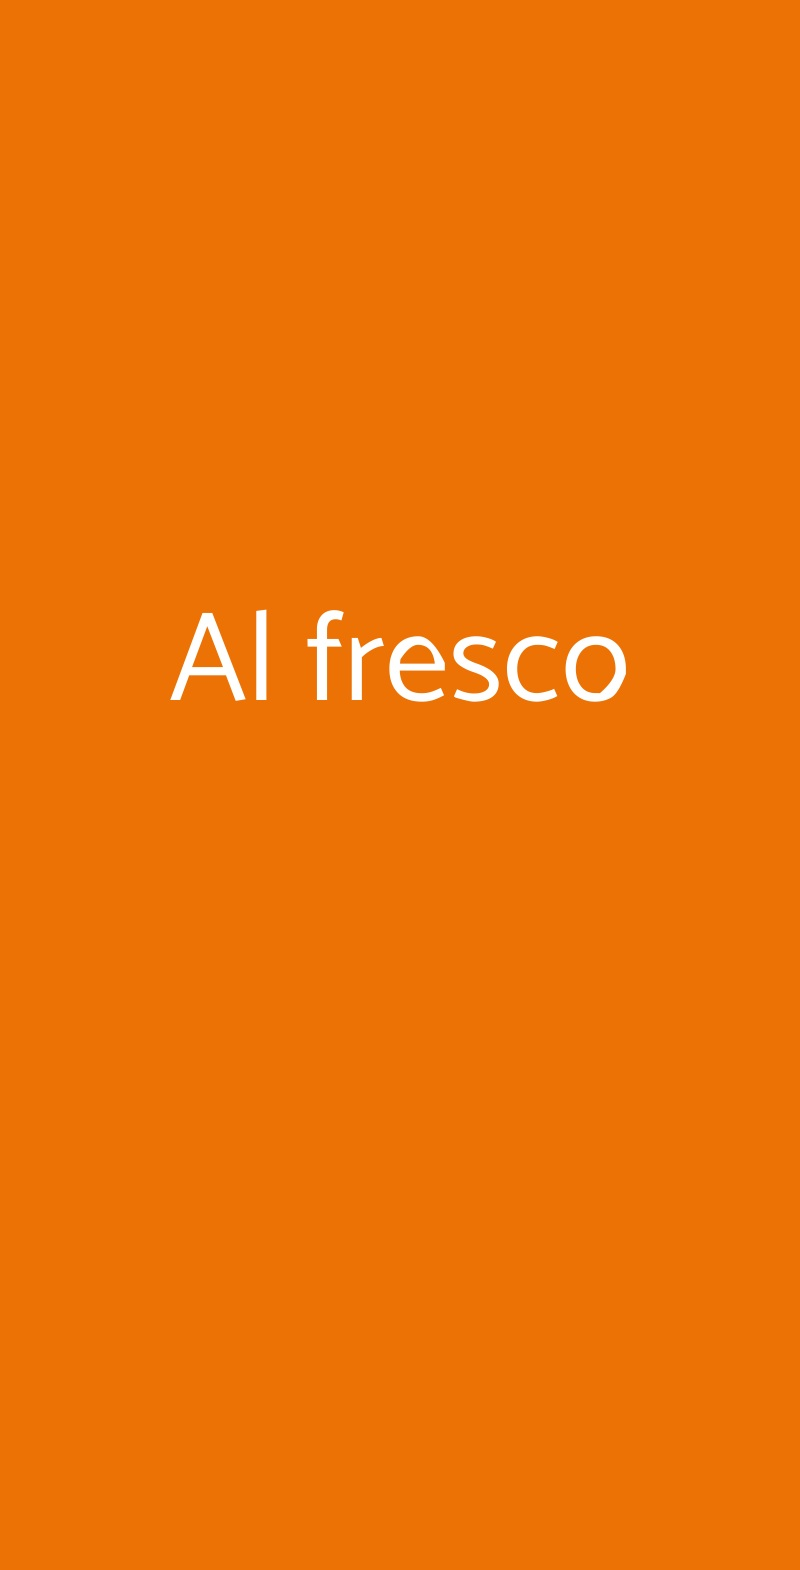 Al fresco Milano menù 1 pagina